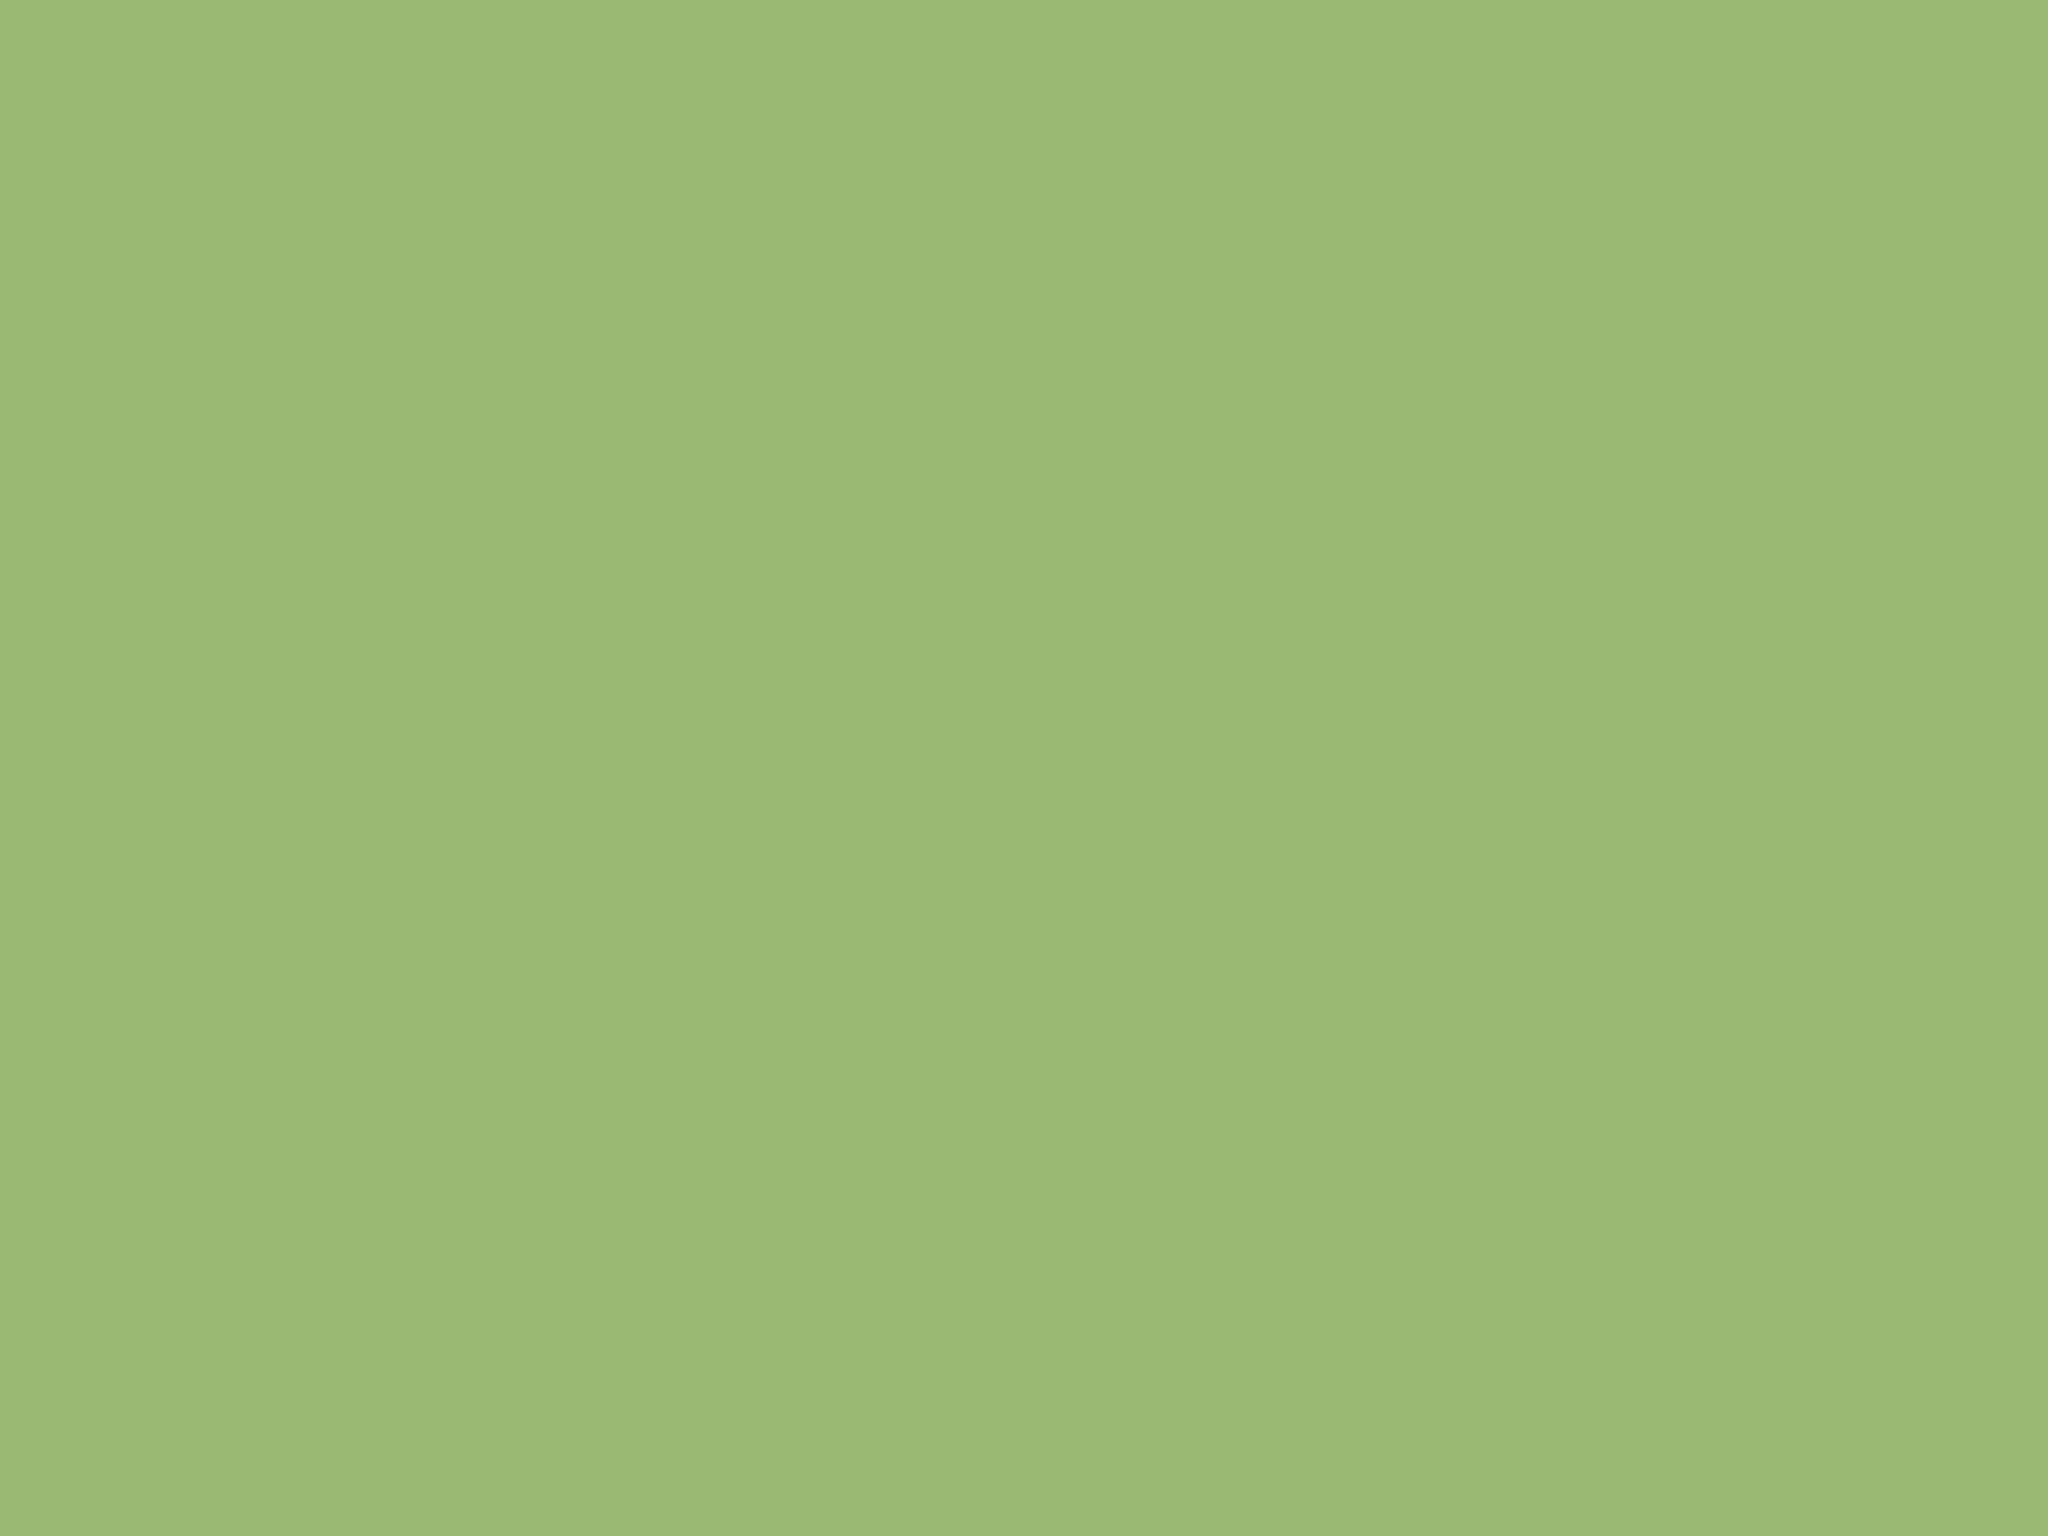 2048x1536 Olivine Solid Color Background